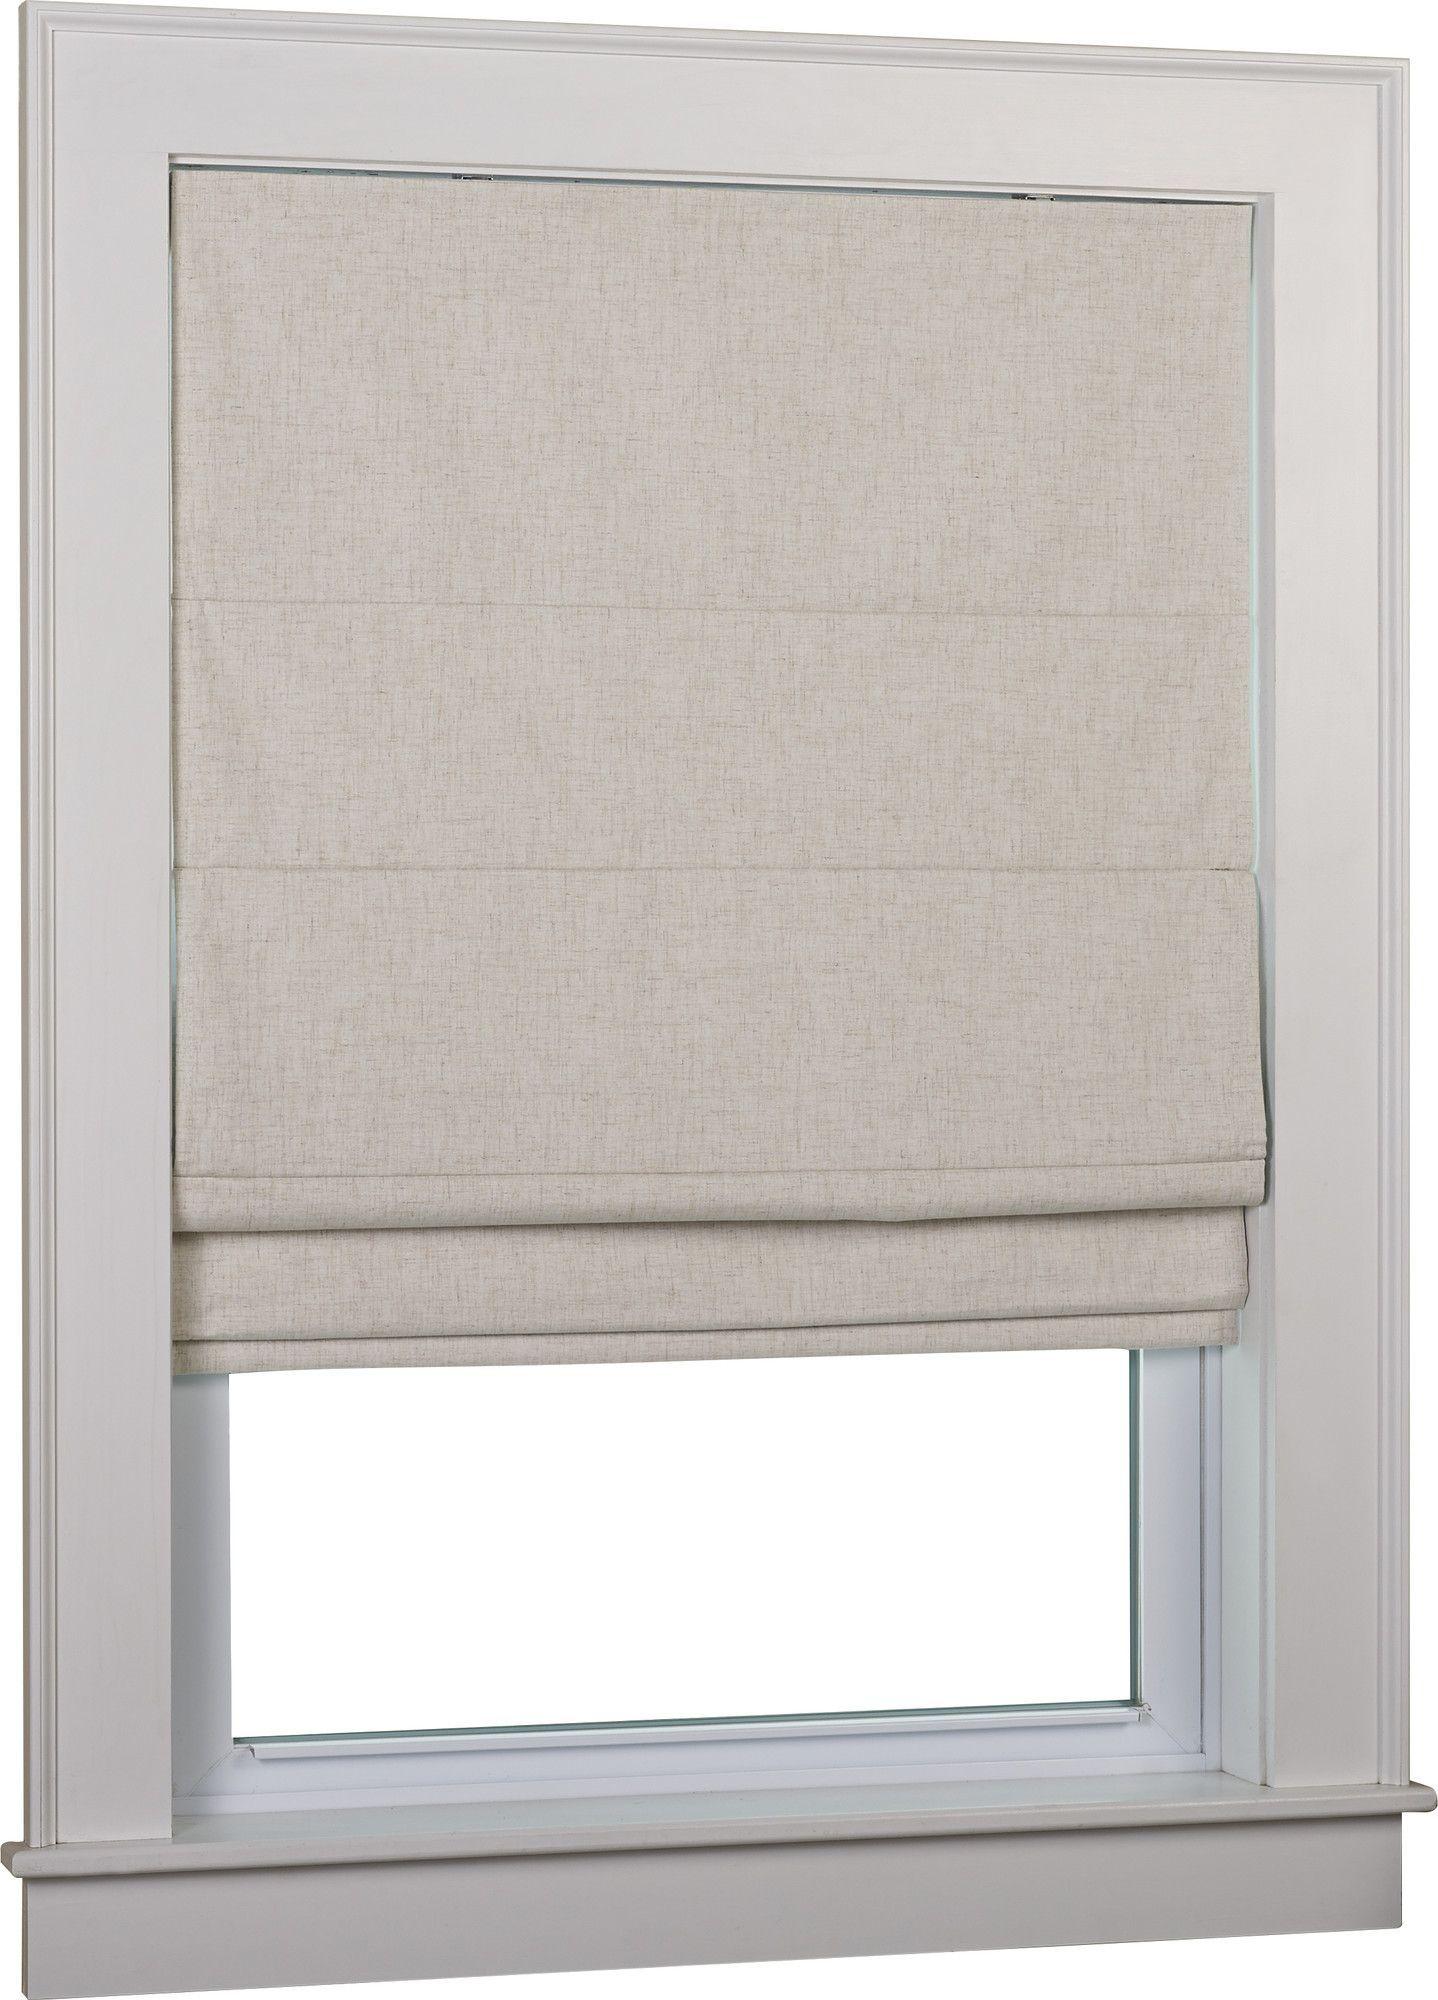 Blackout Bedroom Blinds Brilliant Huntington Linen Cordless Thermal Backed Roman Shade W Blackout Decorating Design